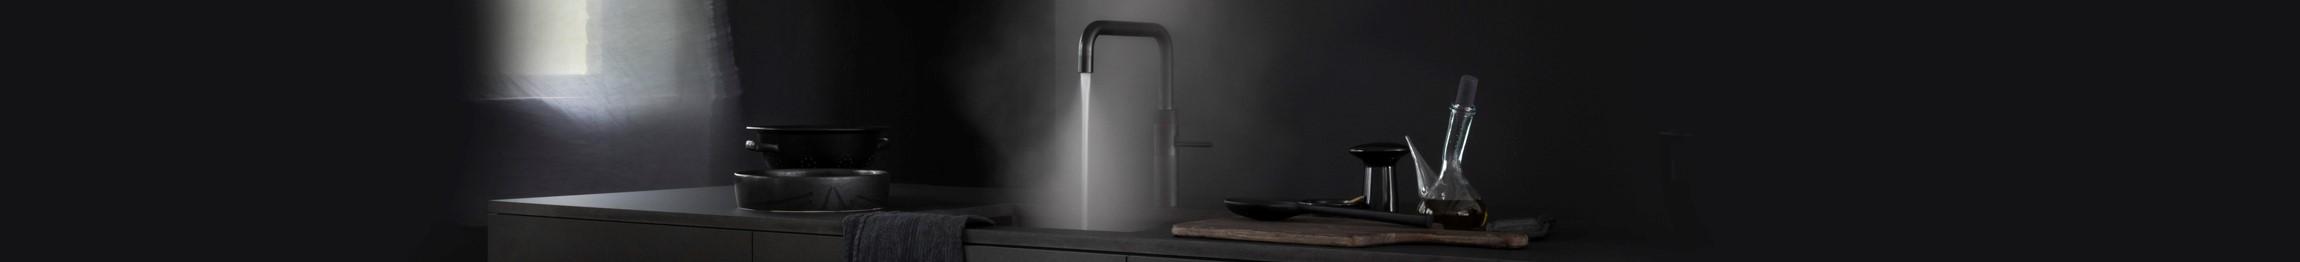 Kokend Water Kranen.Quooker Kokend Water Kranen Technische Unie